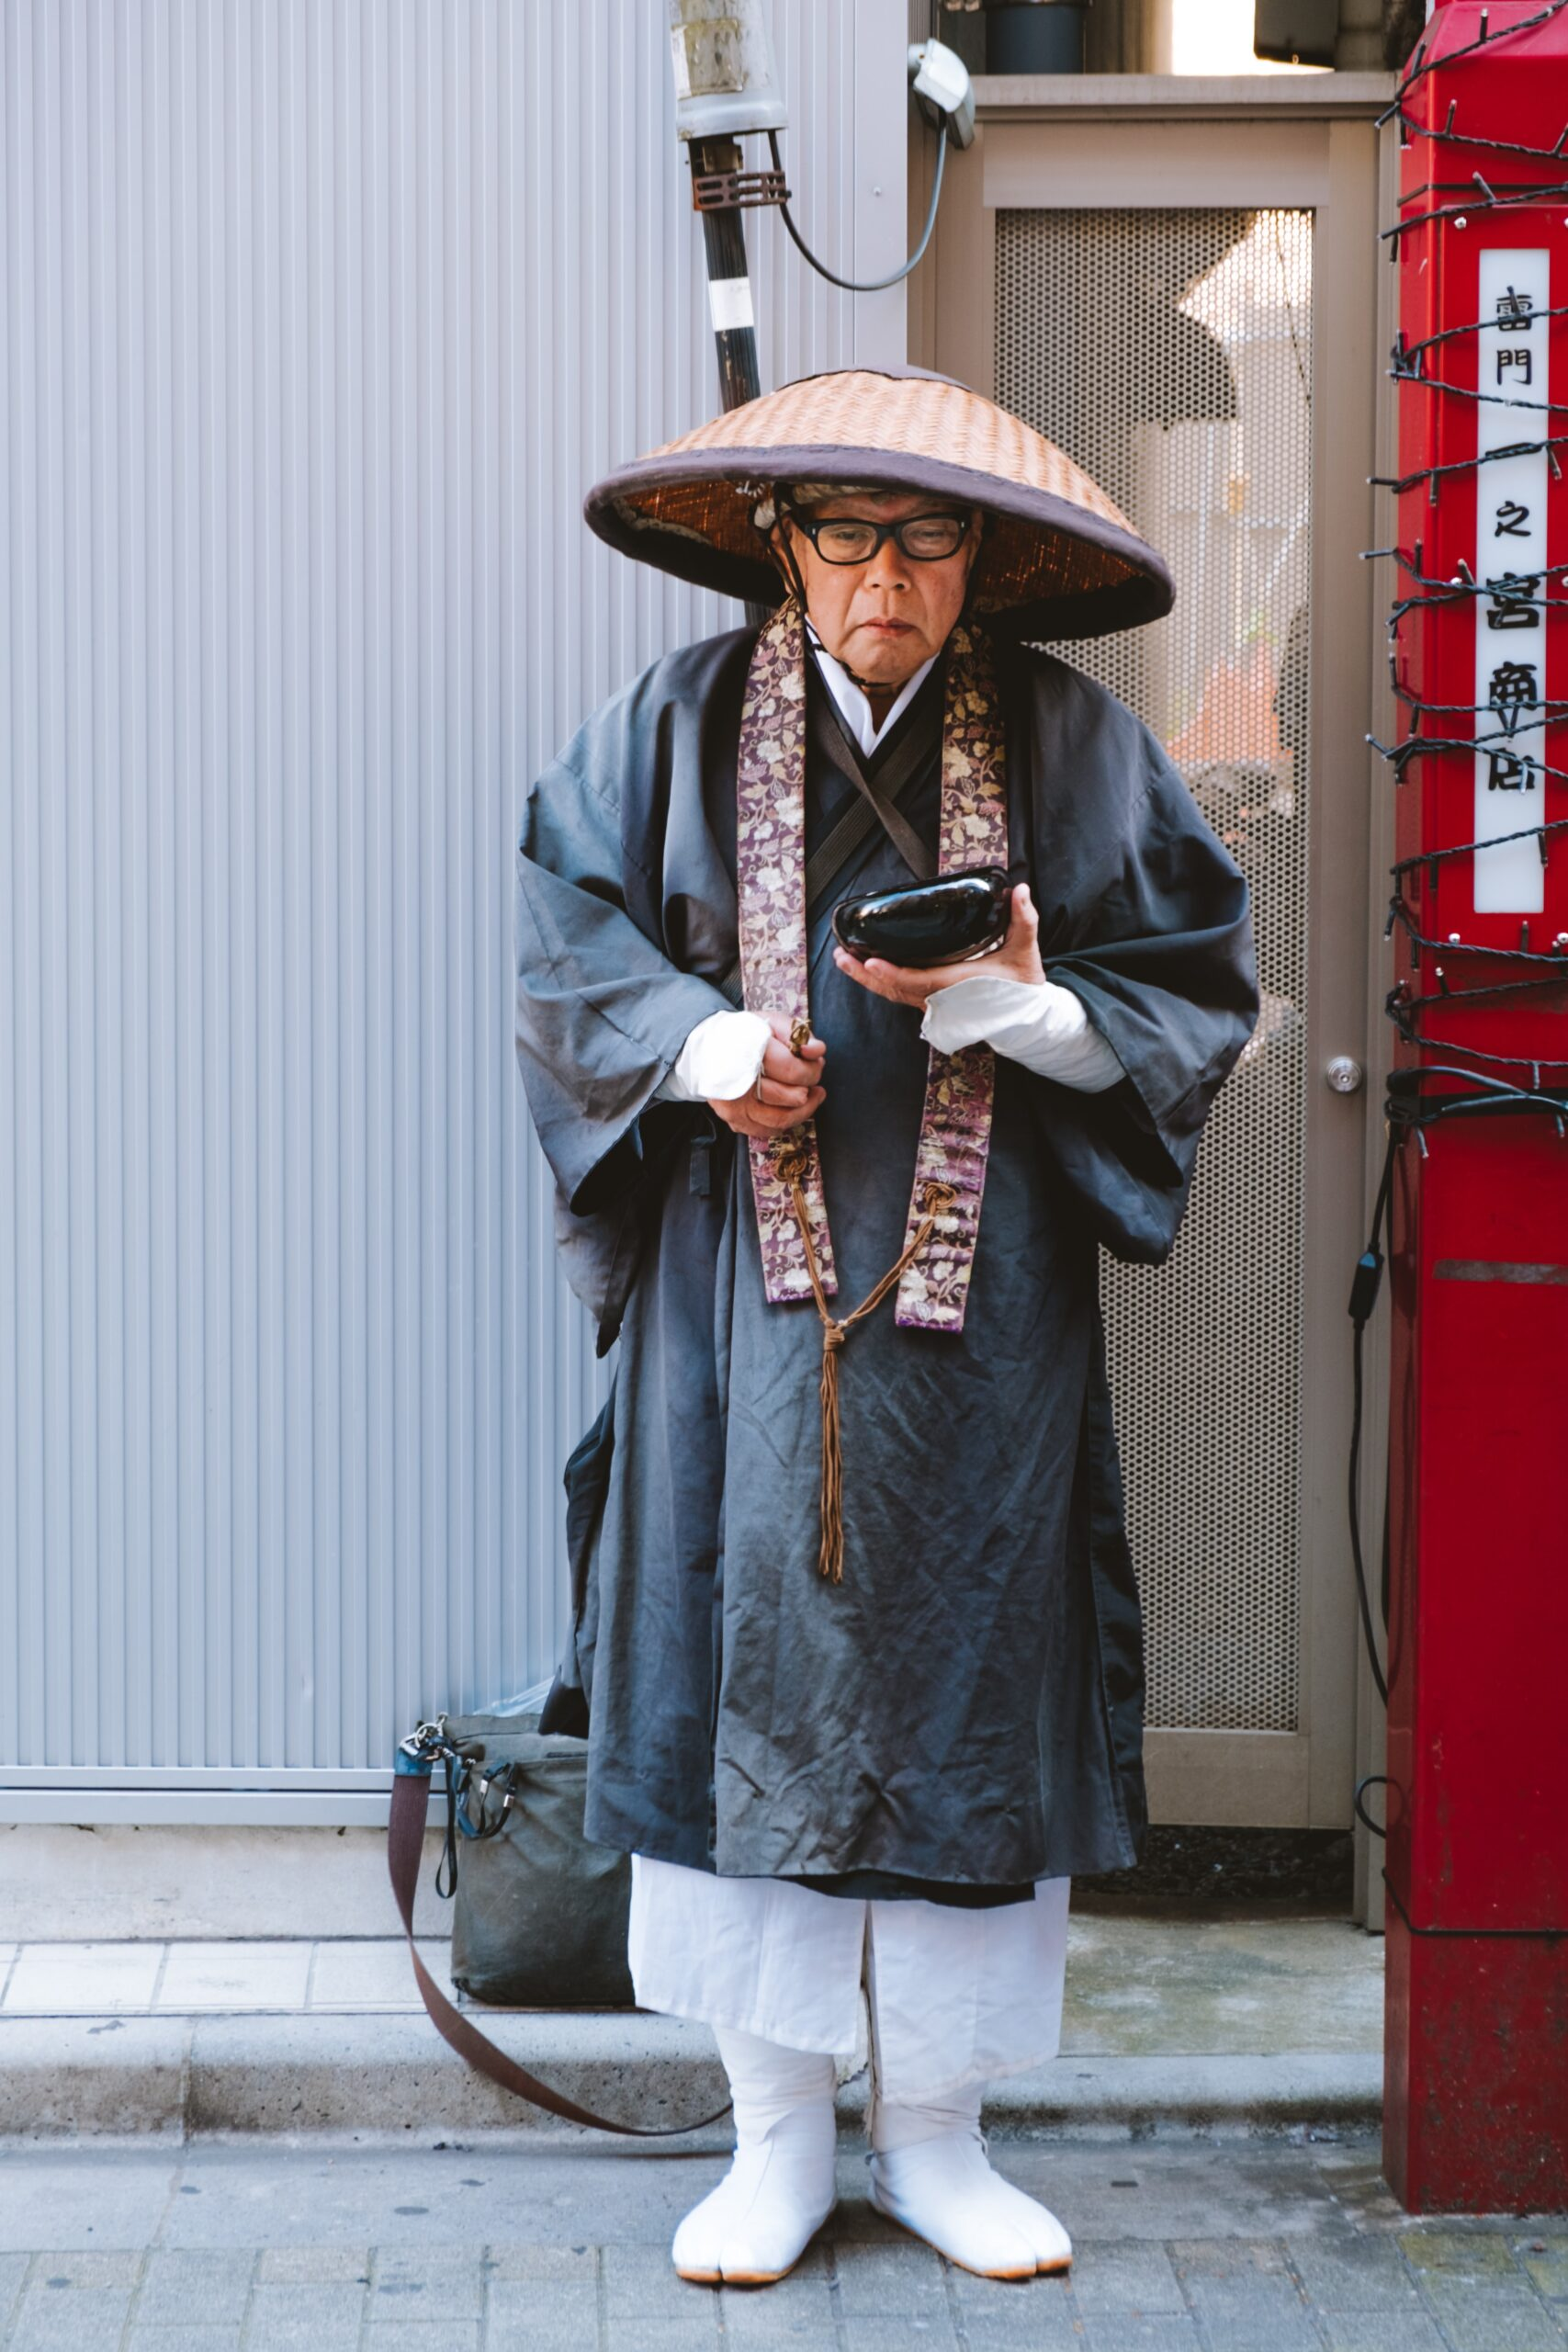 lucrezia-carnelos-Japanese Zen buddhist priest with bamboo hat holding black soapstone bowl-unsplash